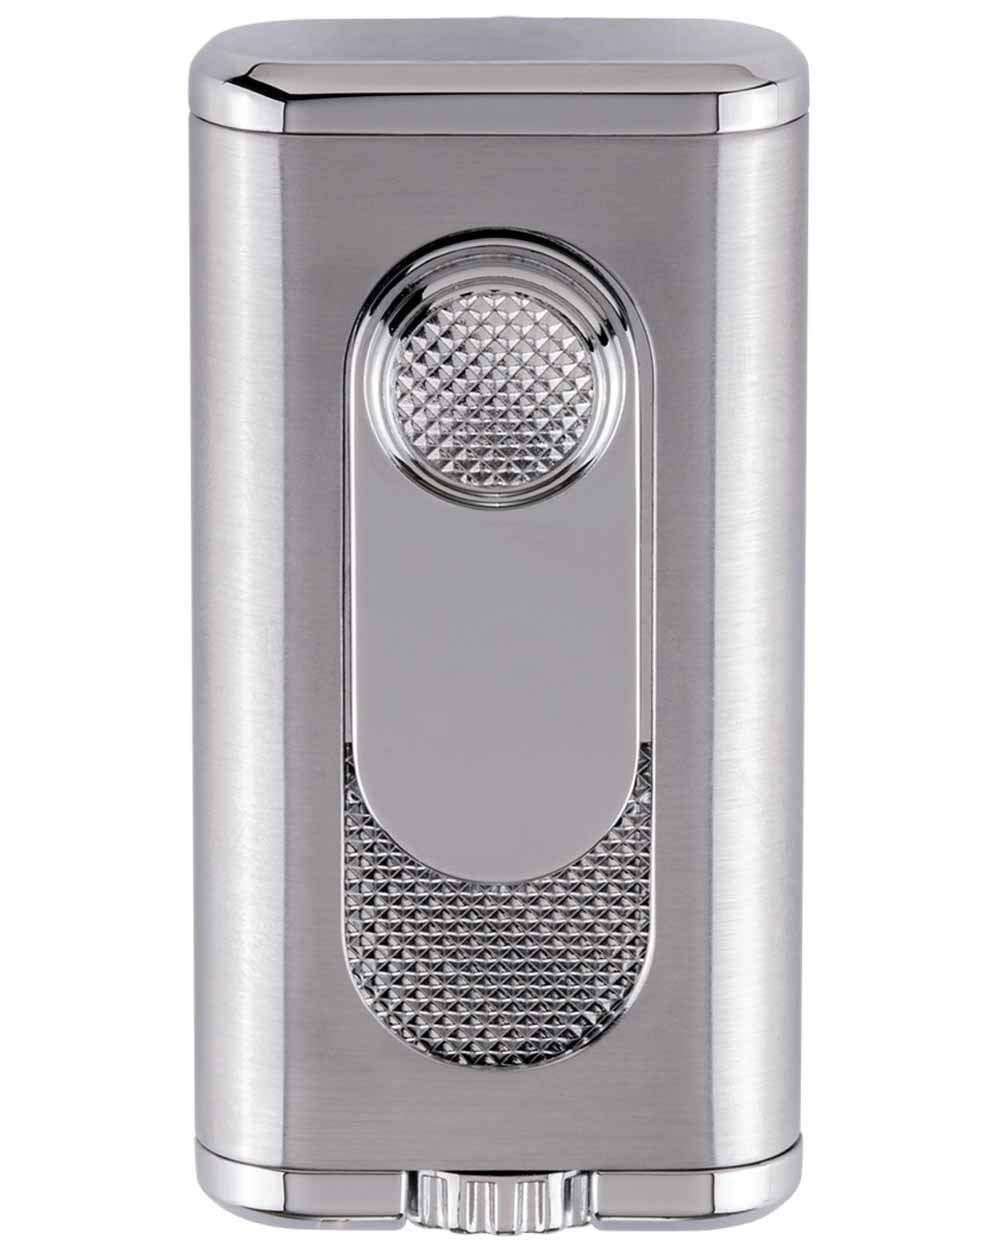 Xikar Verano Flat Flame Cigar Lighter, Attractive Gift Box, Elegant Metal Construction, Lifetime Warranty, Silver